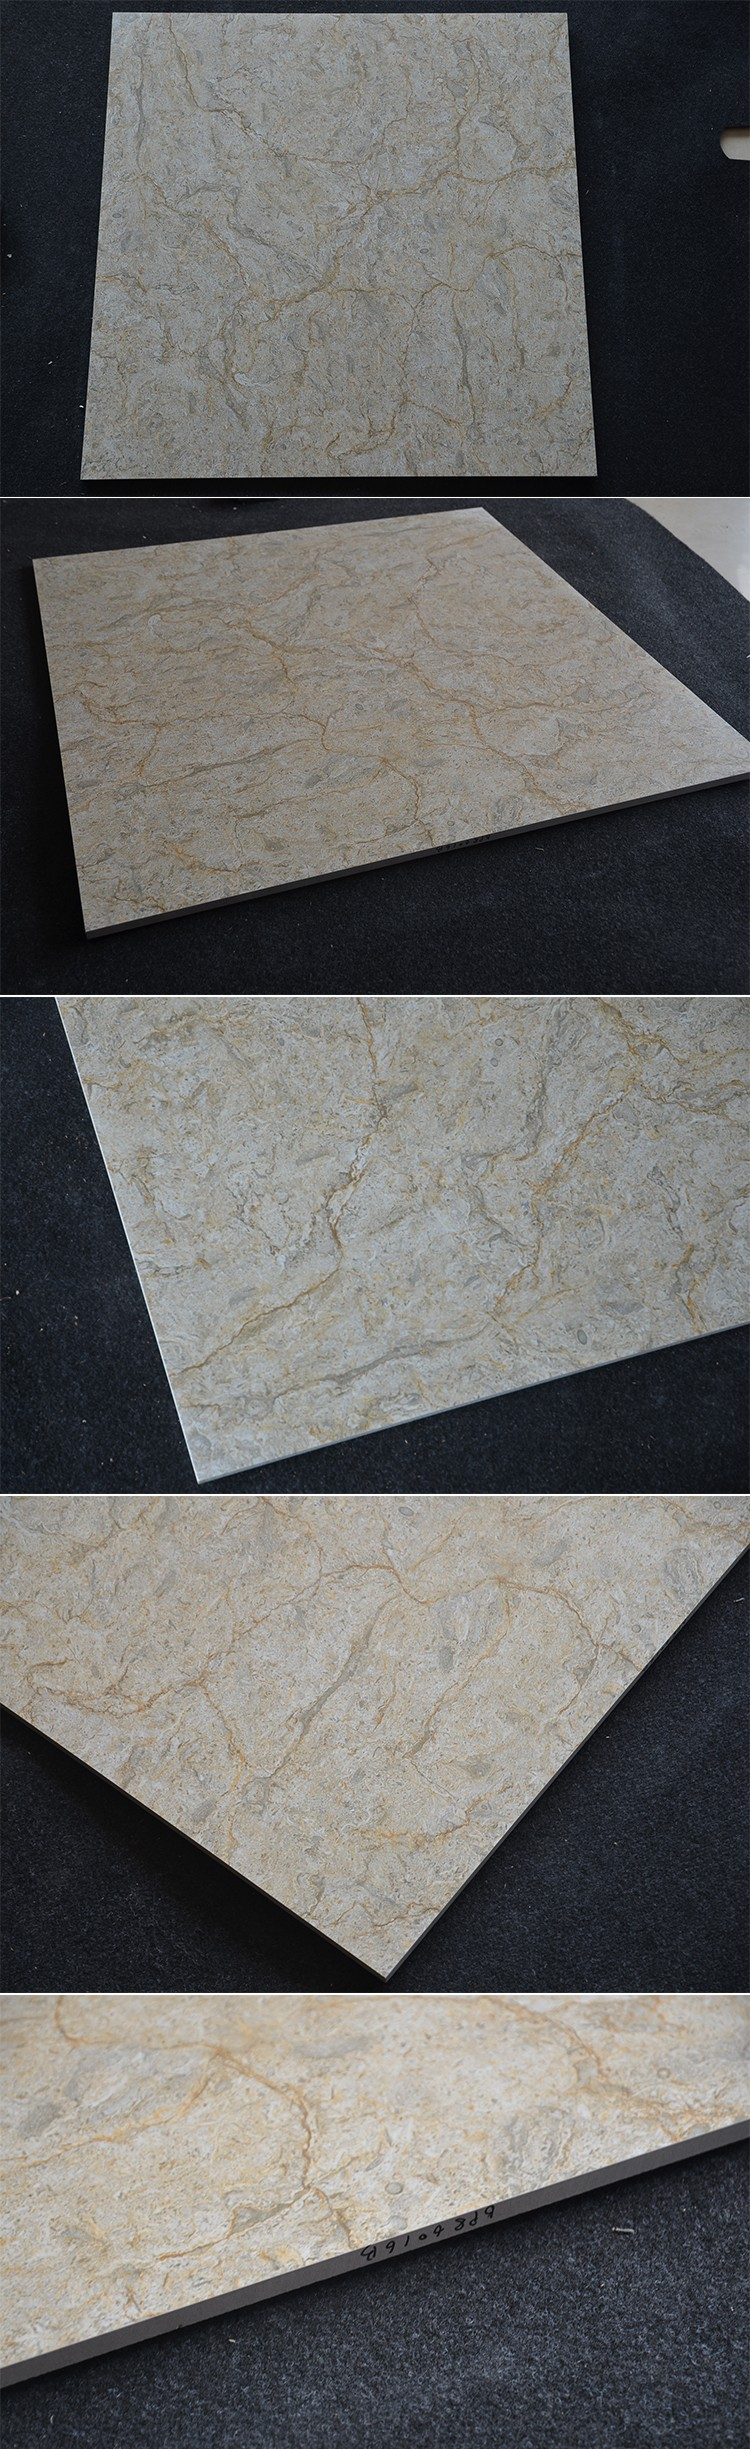 Hmp647m 24x24 floor tilecheapest ceramic tile with pricekitchen hmp647m 24x24 floor tilecheapest ceramic tile with pricekitchen tile dailygadgetfo Image collections